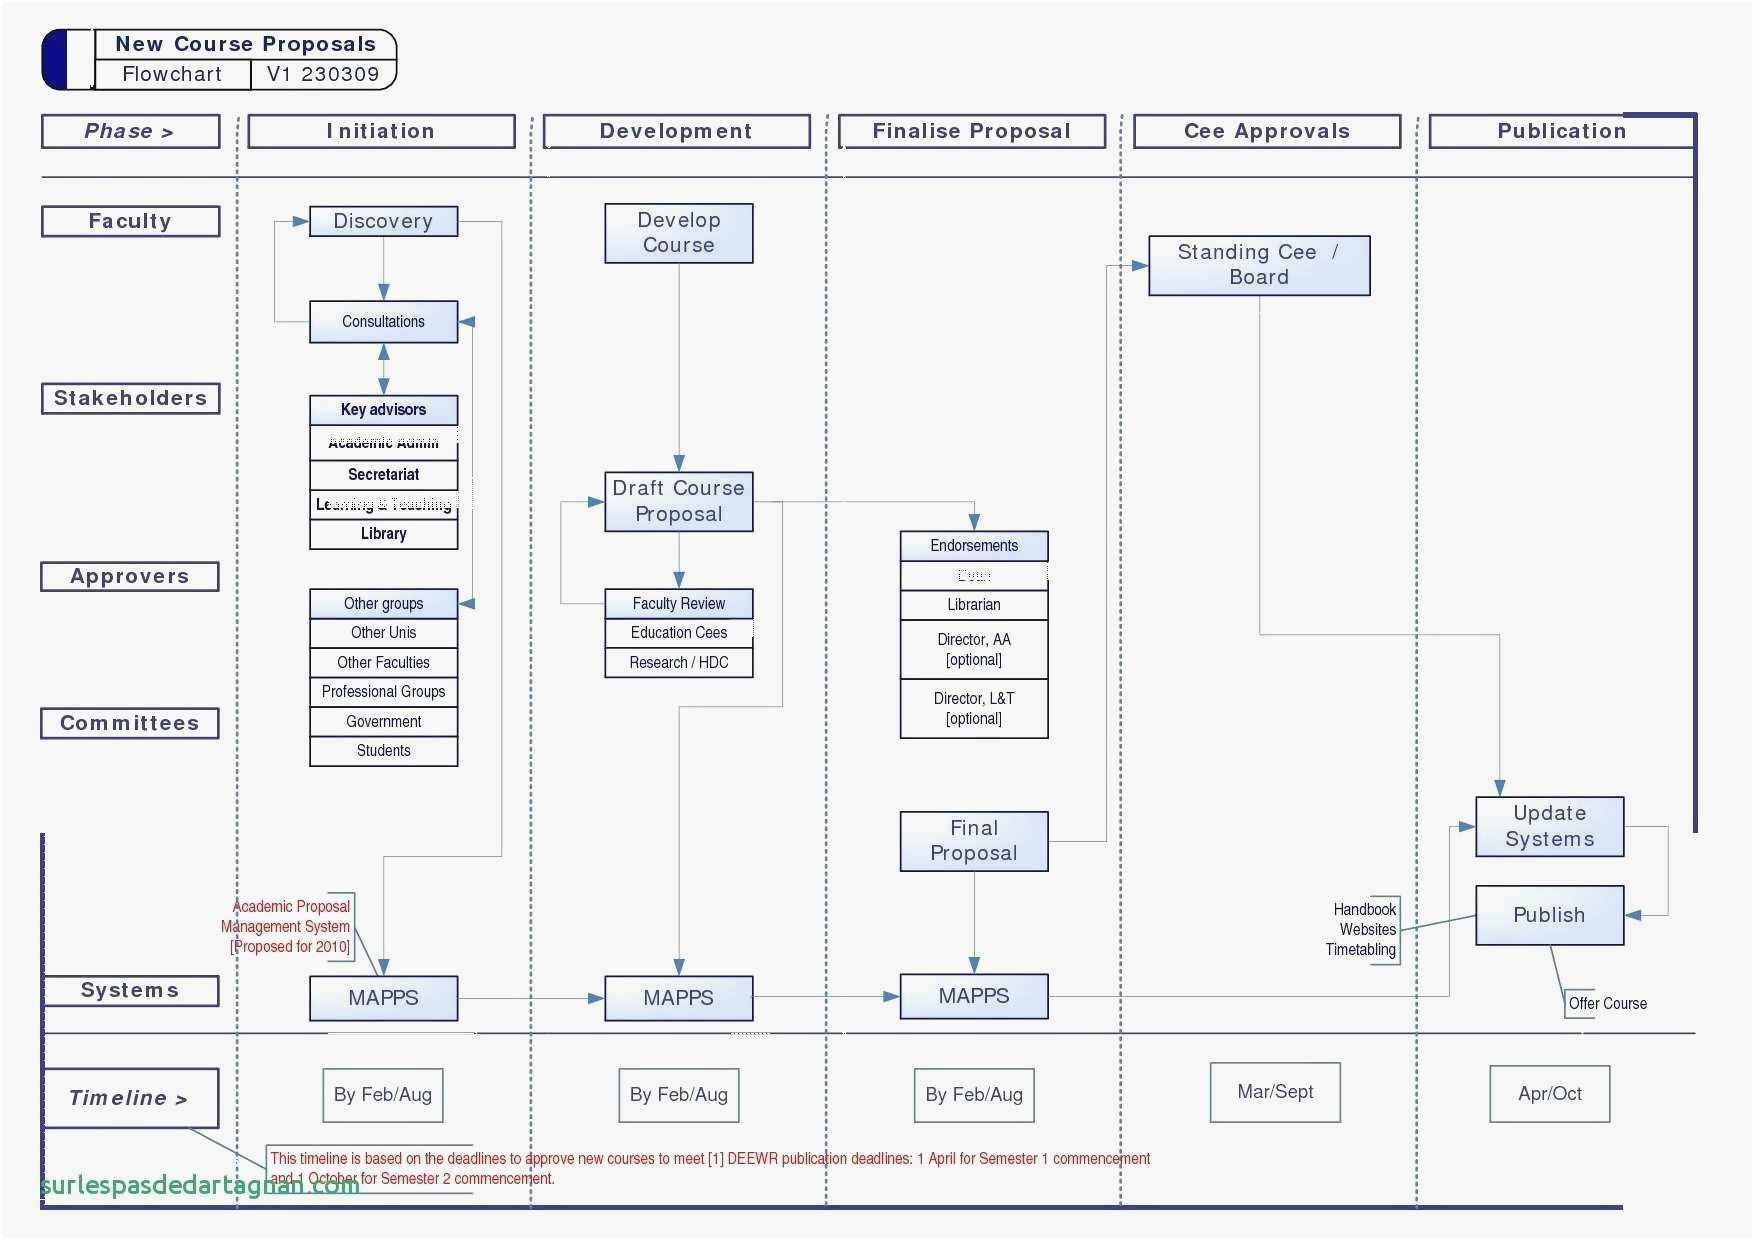 Visio Data Center Floor Plan Template In 2020 Flow Chart